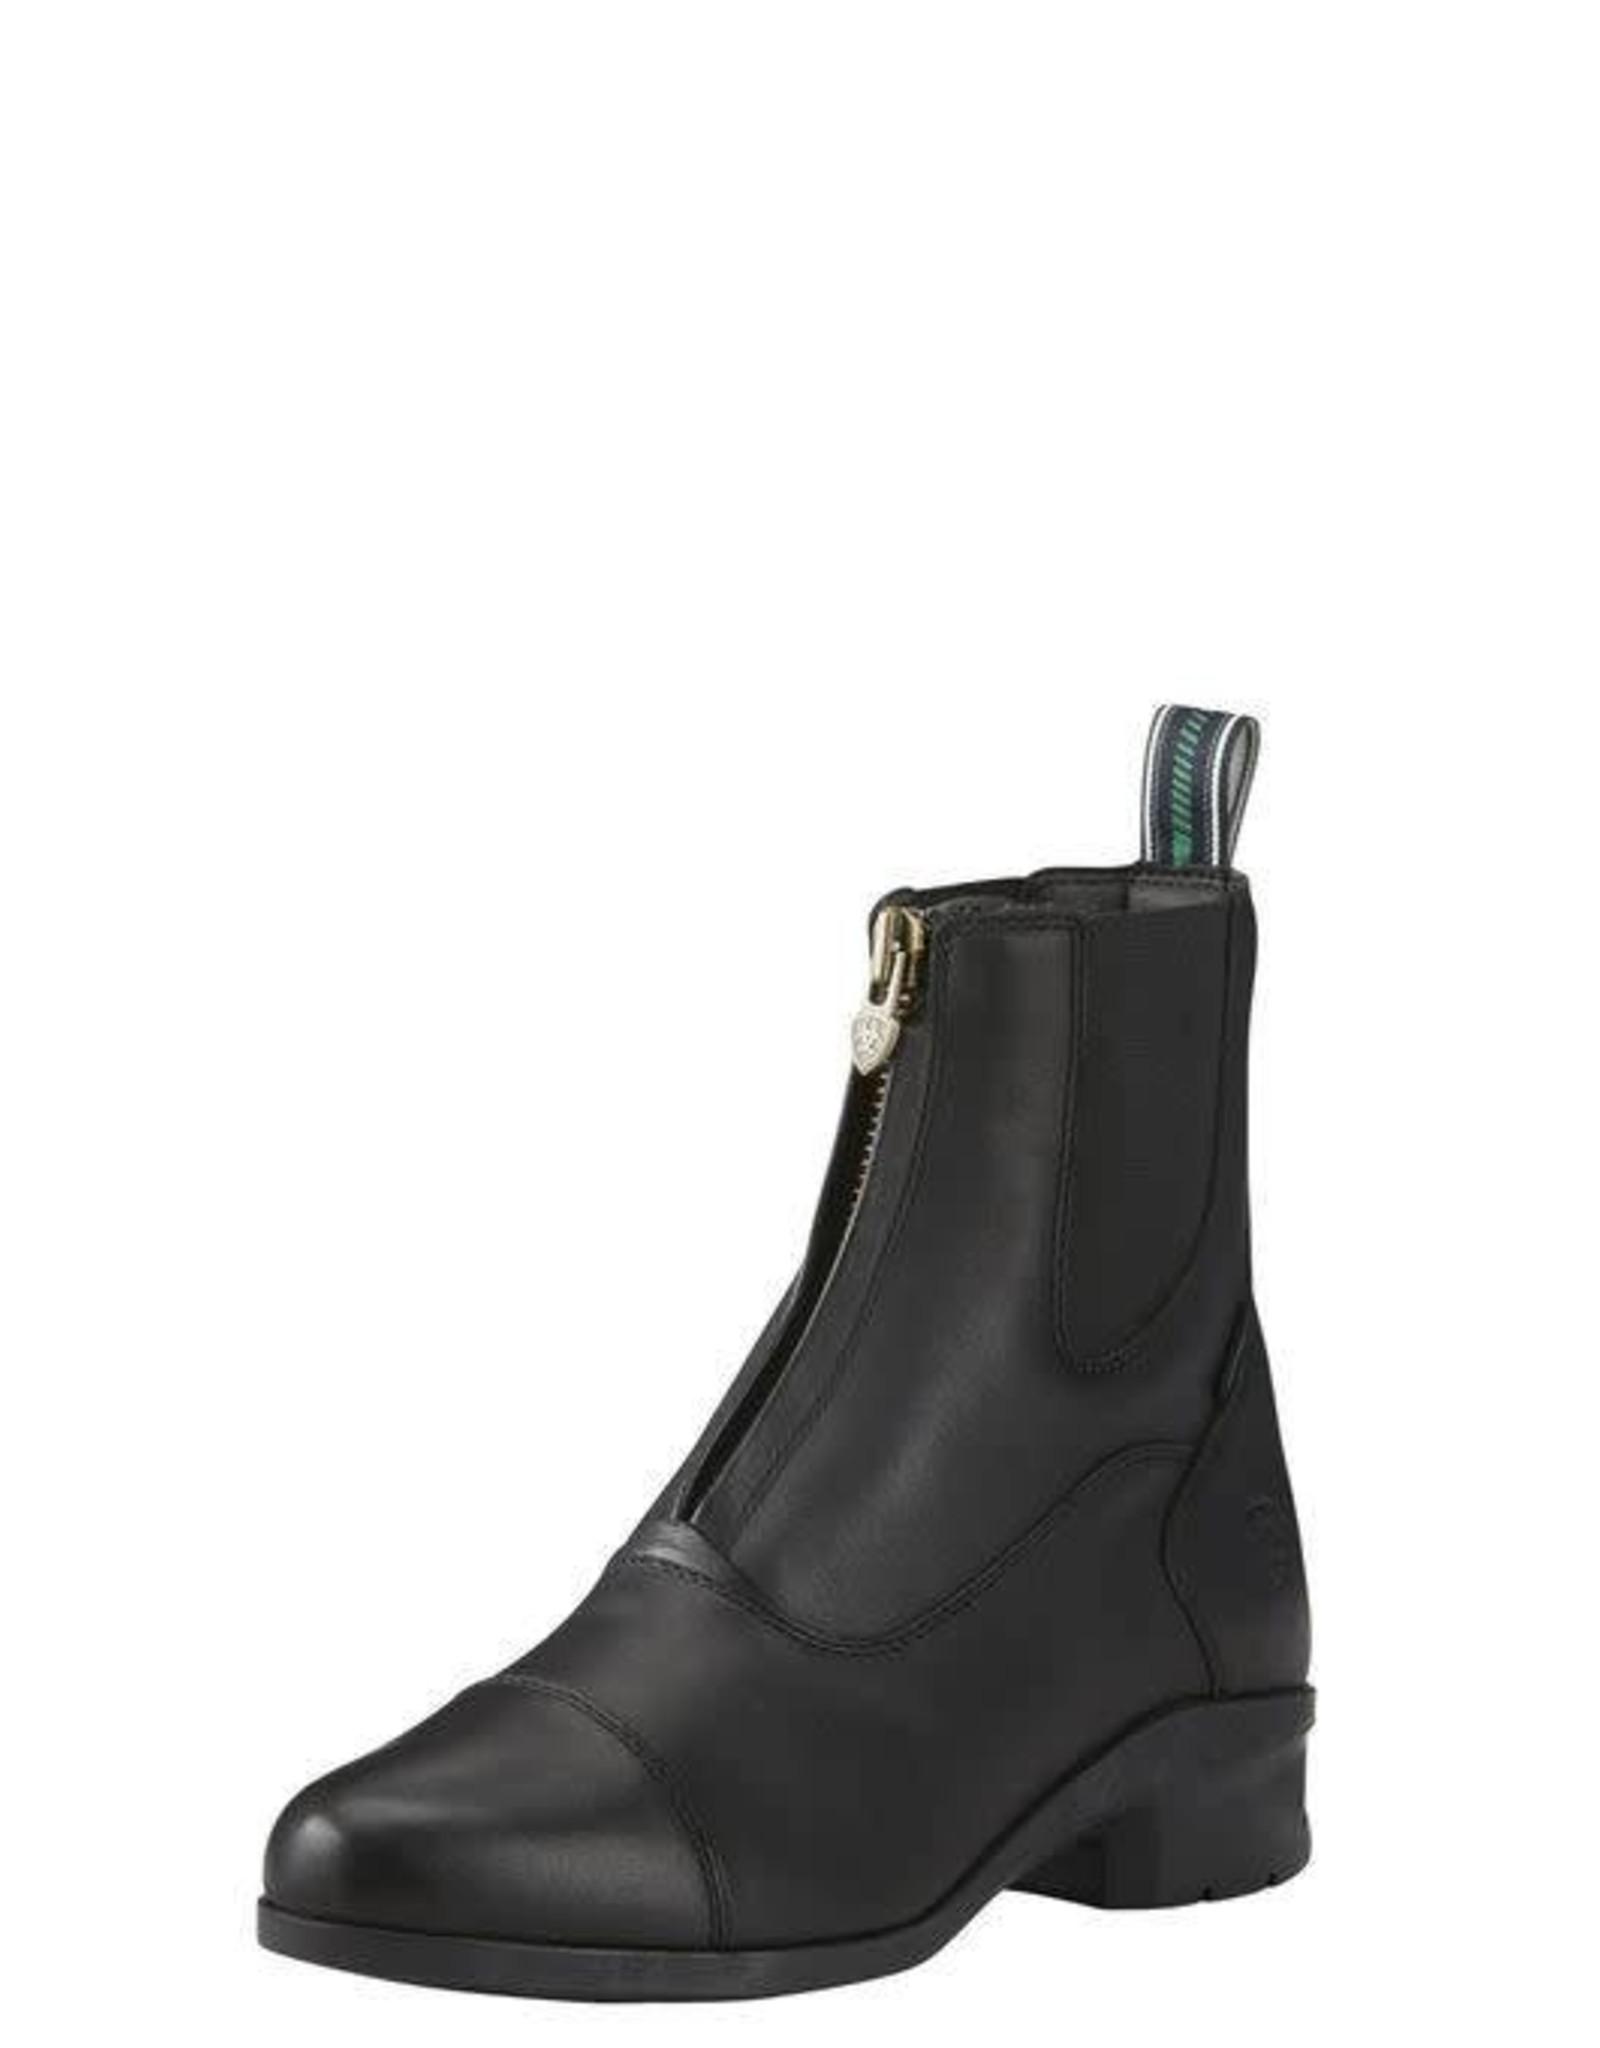 Ariat Ariat Heritage Zip Paddock Ladies  - Black - 6.5